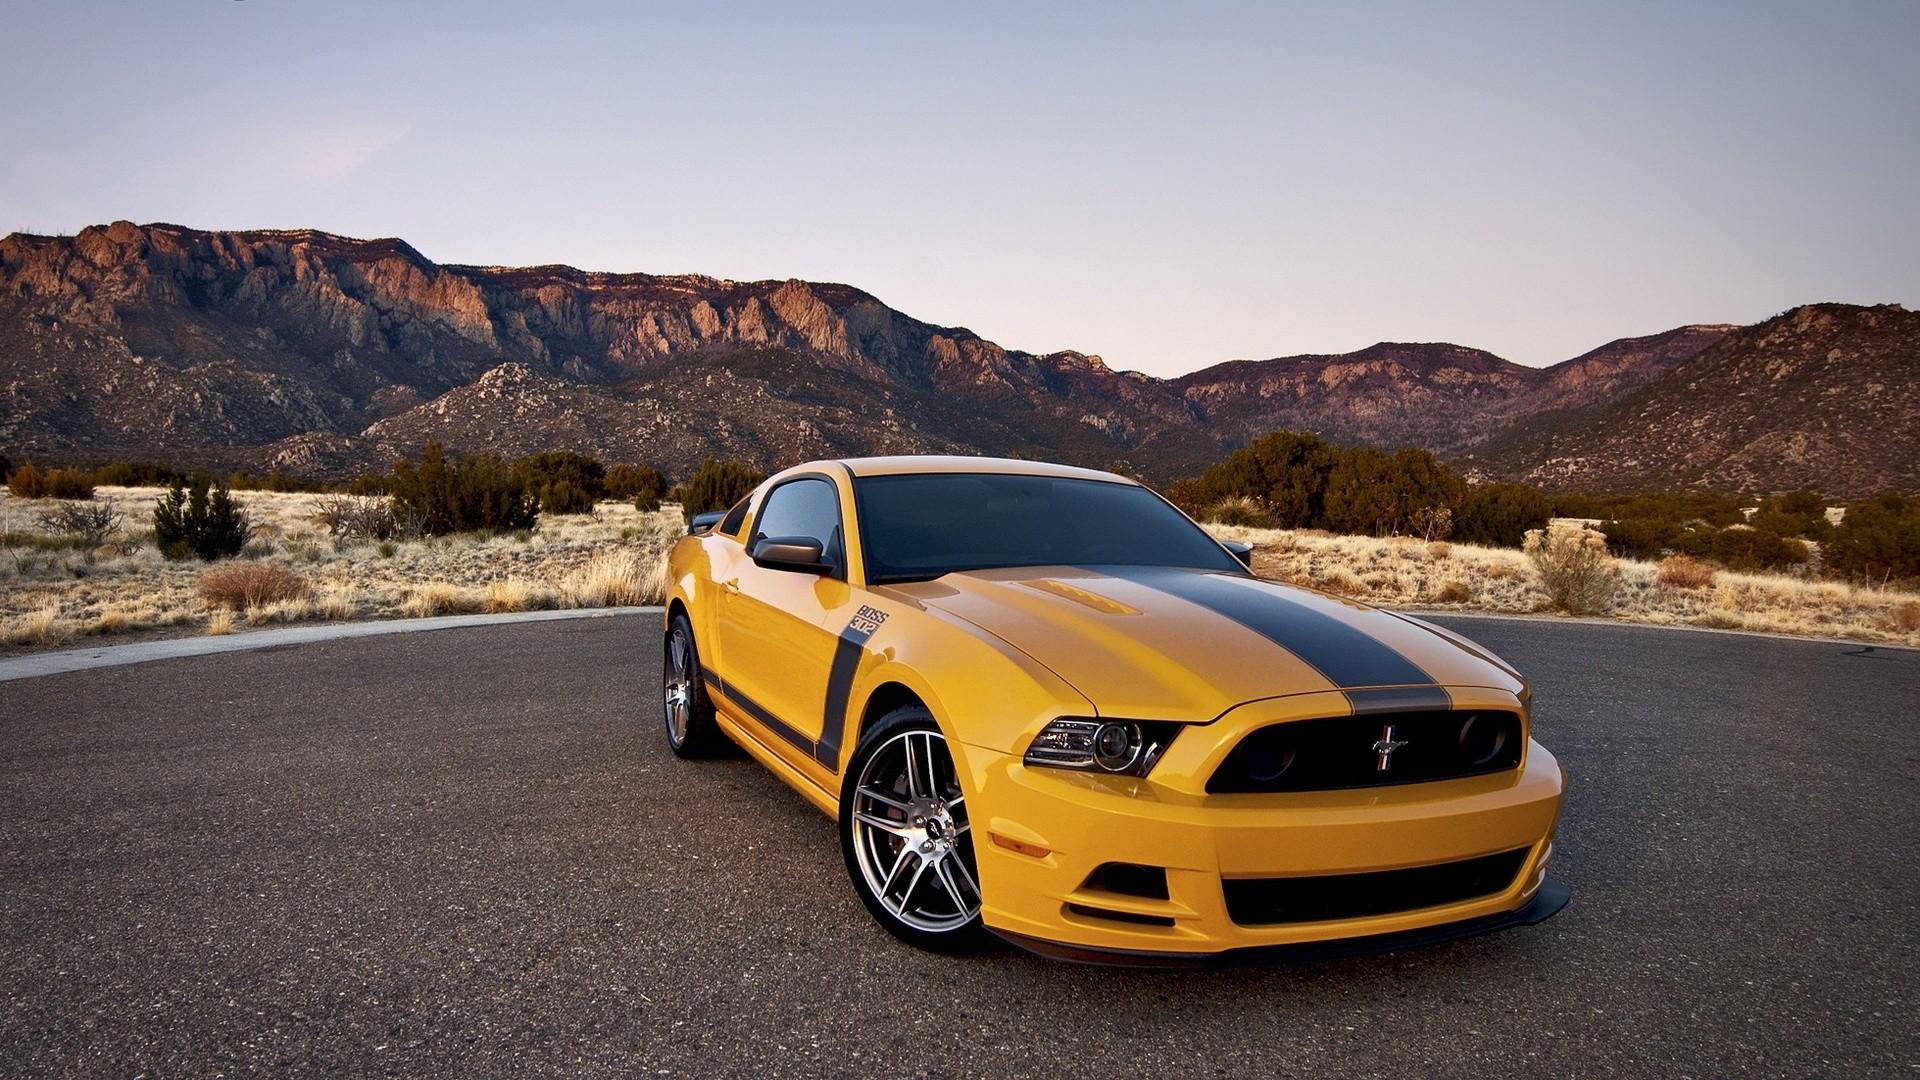 Mustang Wallpaper Download